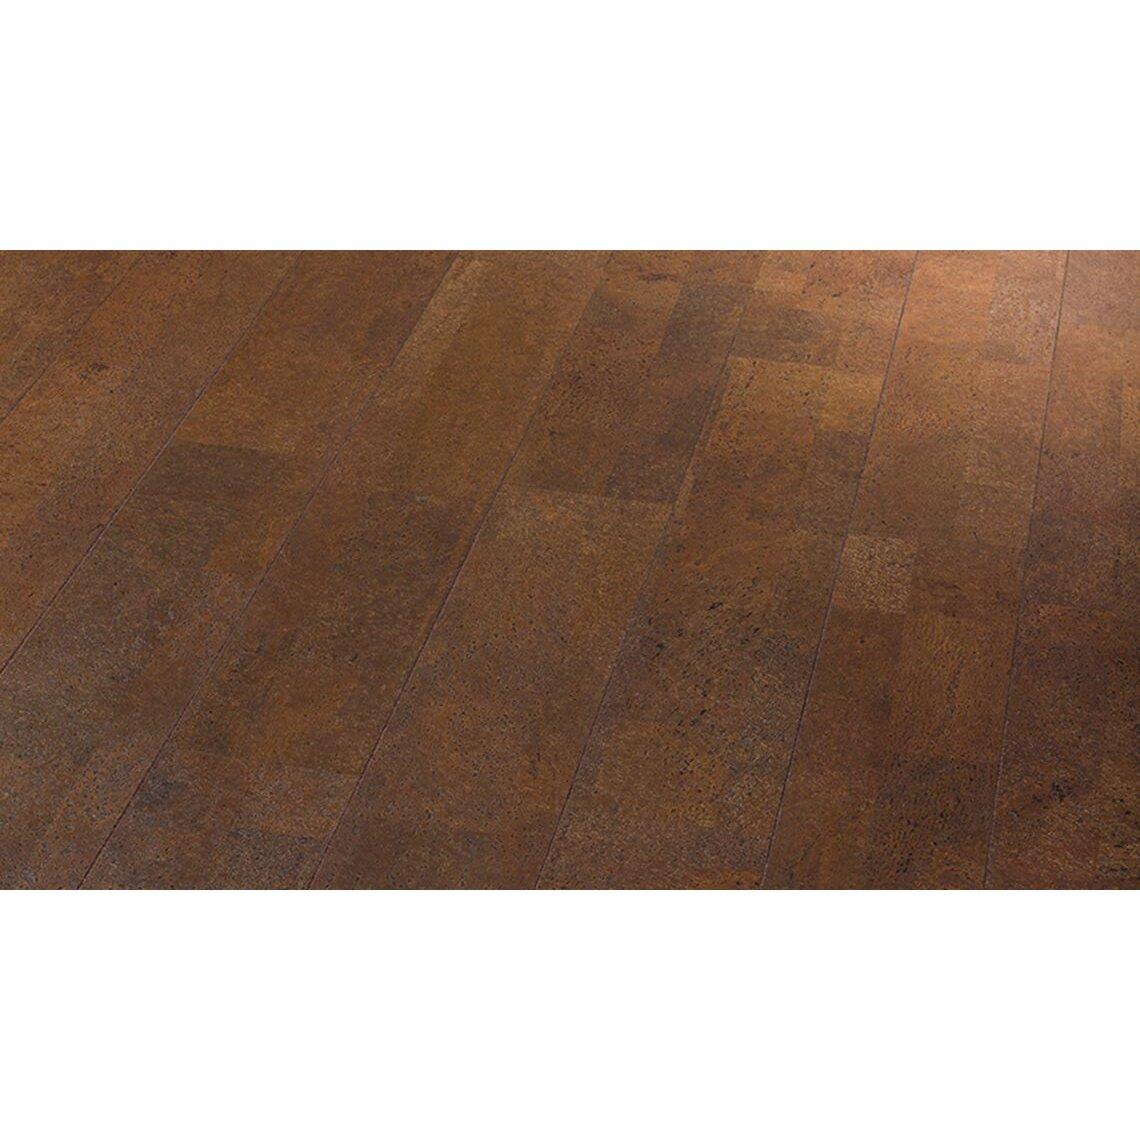 "Cork Flooring High Humidity: CorkComfort 11-5/8"" Engineered Cork And Oak Hardwood"